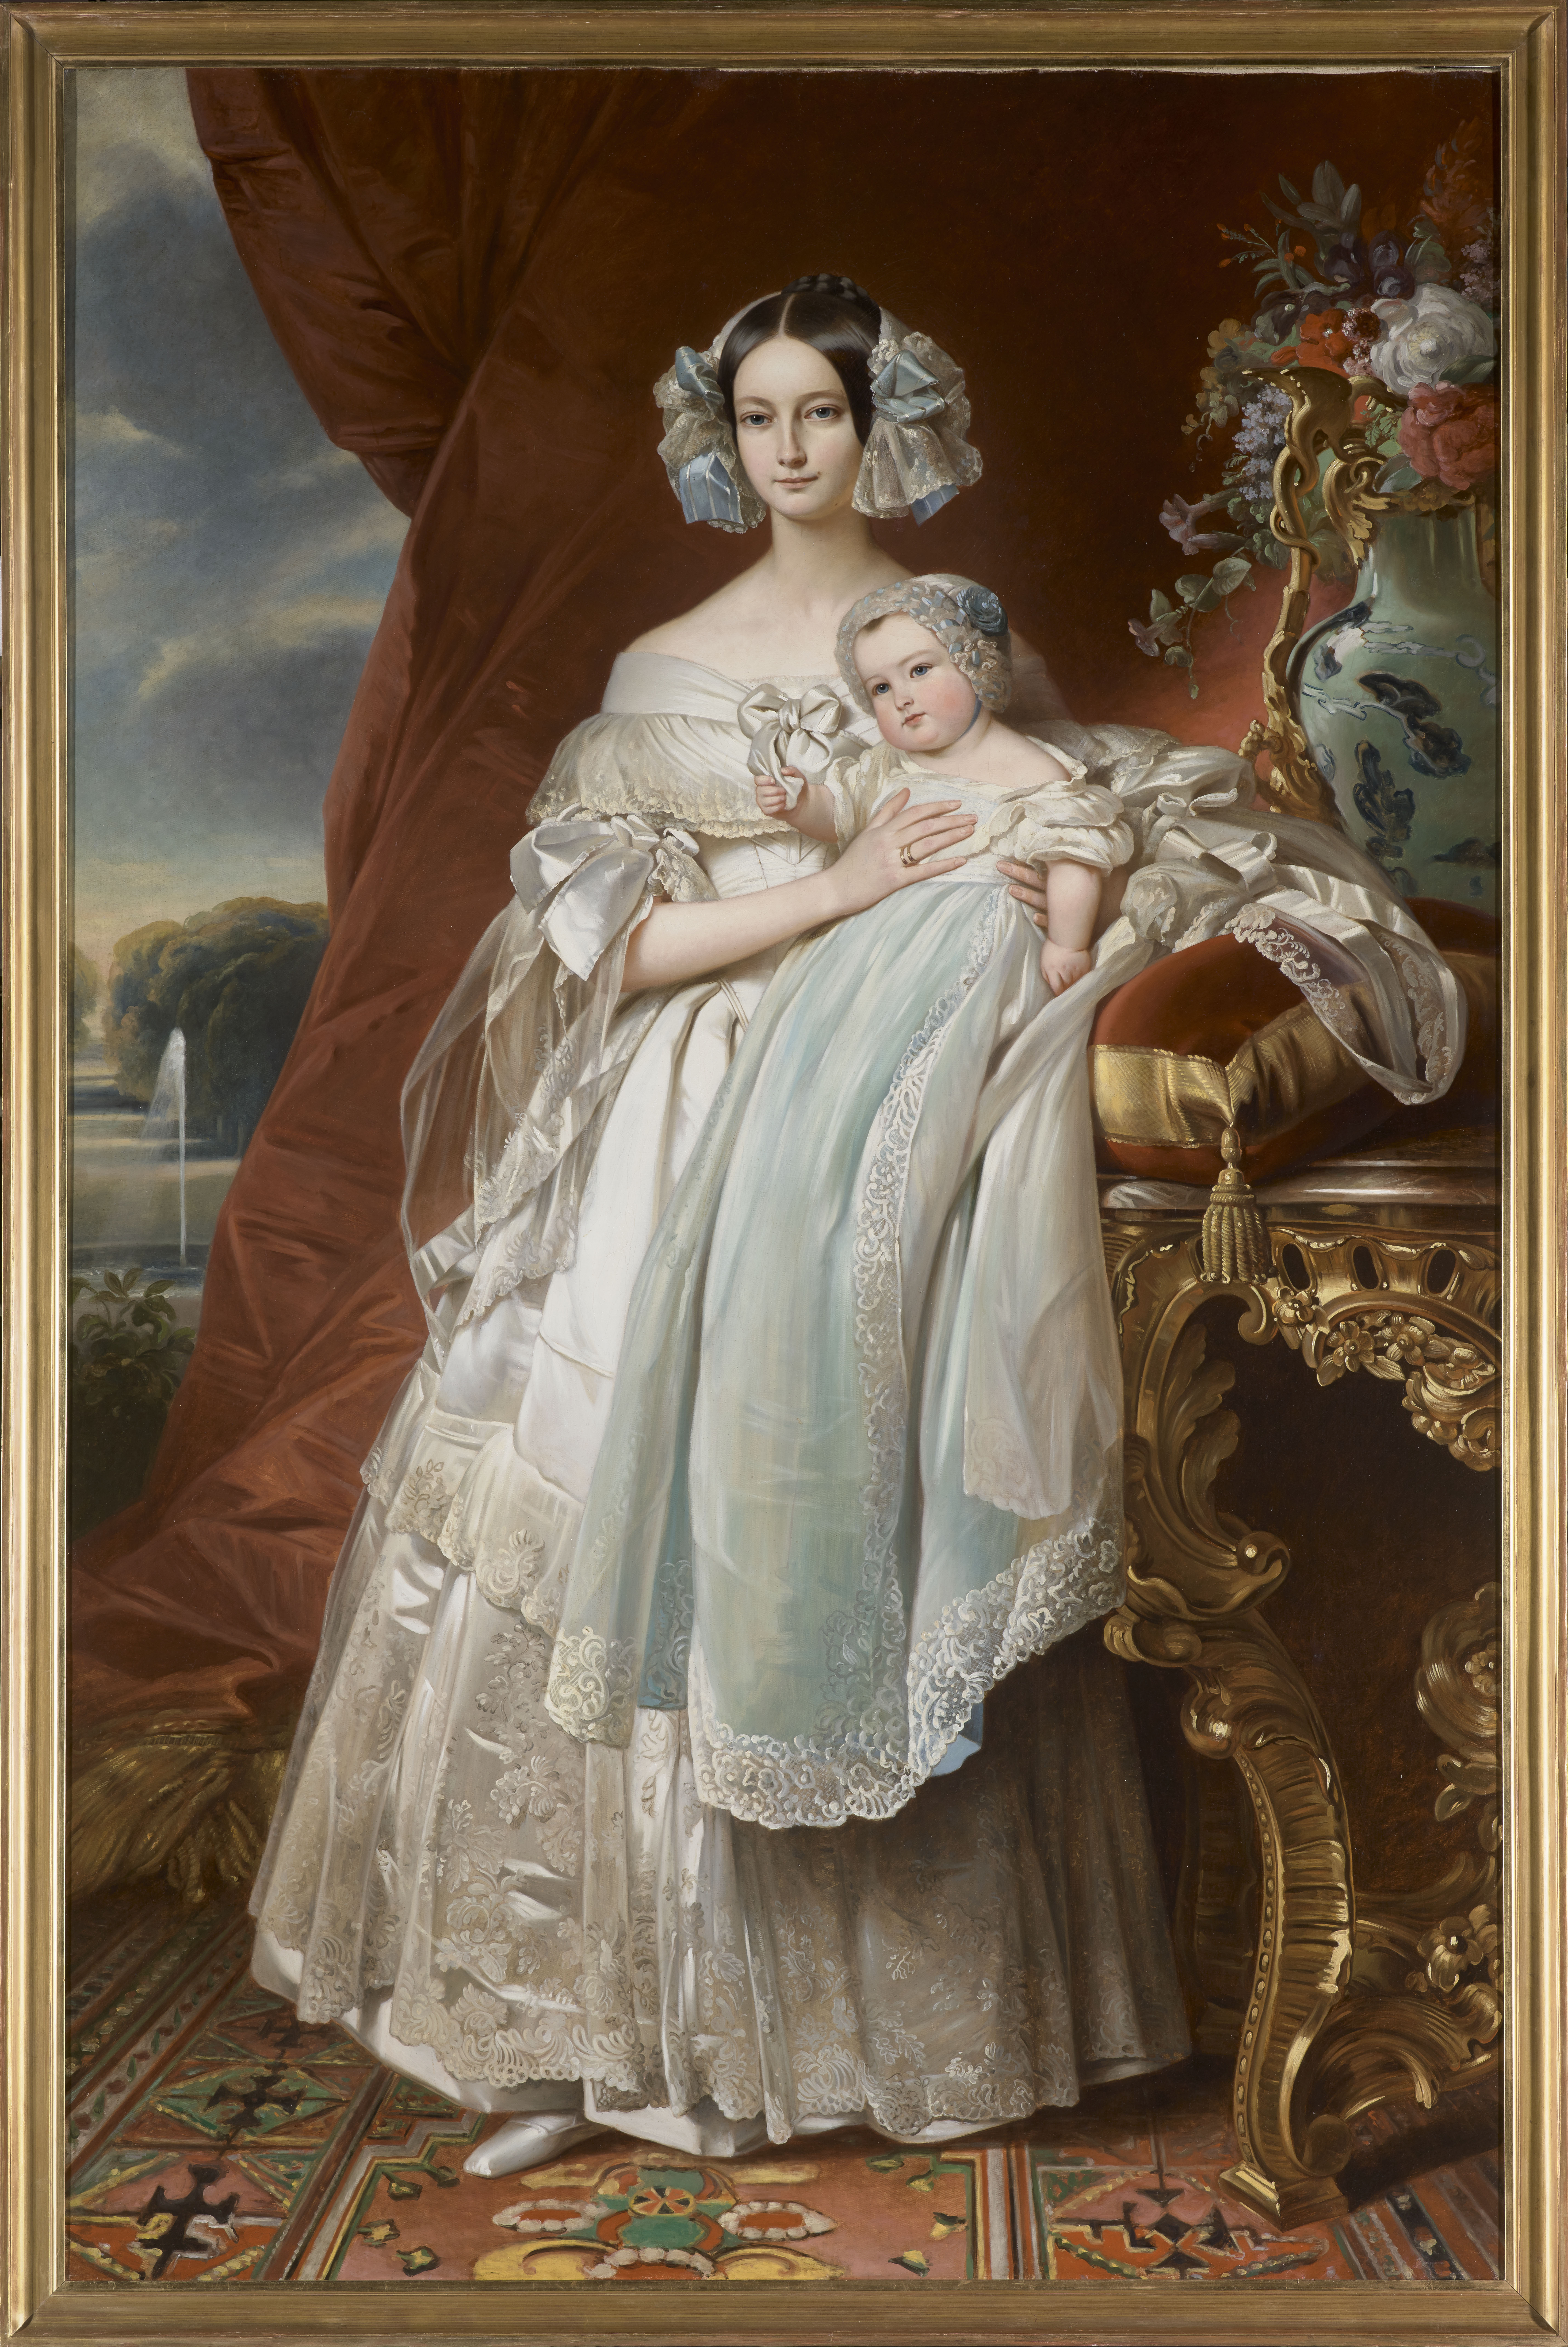 Helene-Louise de Mecklenburg-Schwerin Duchess of Orleans and her son - château de Fontainebleau - © RMN Grand Palais